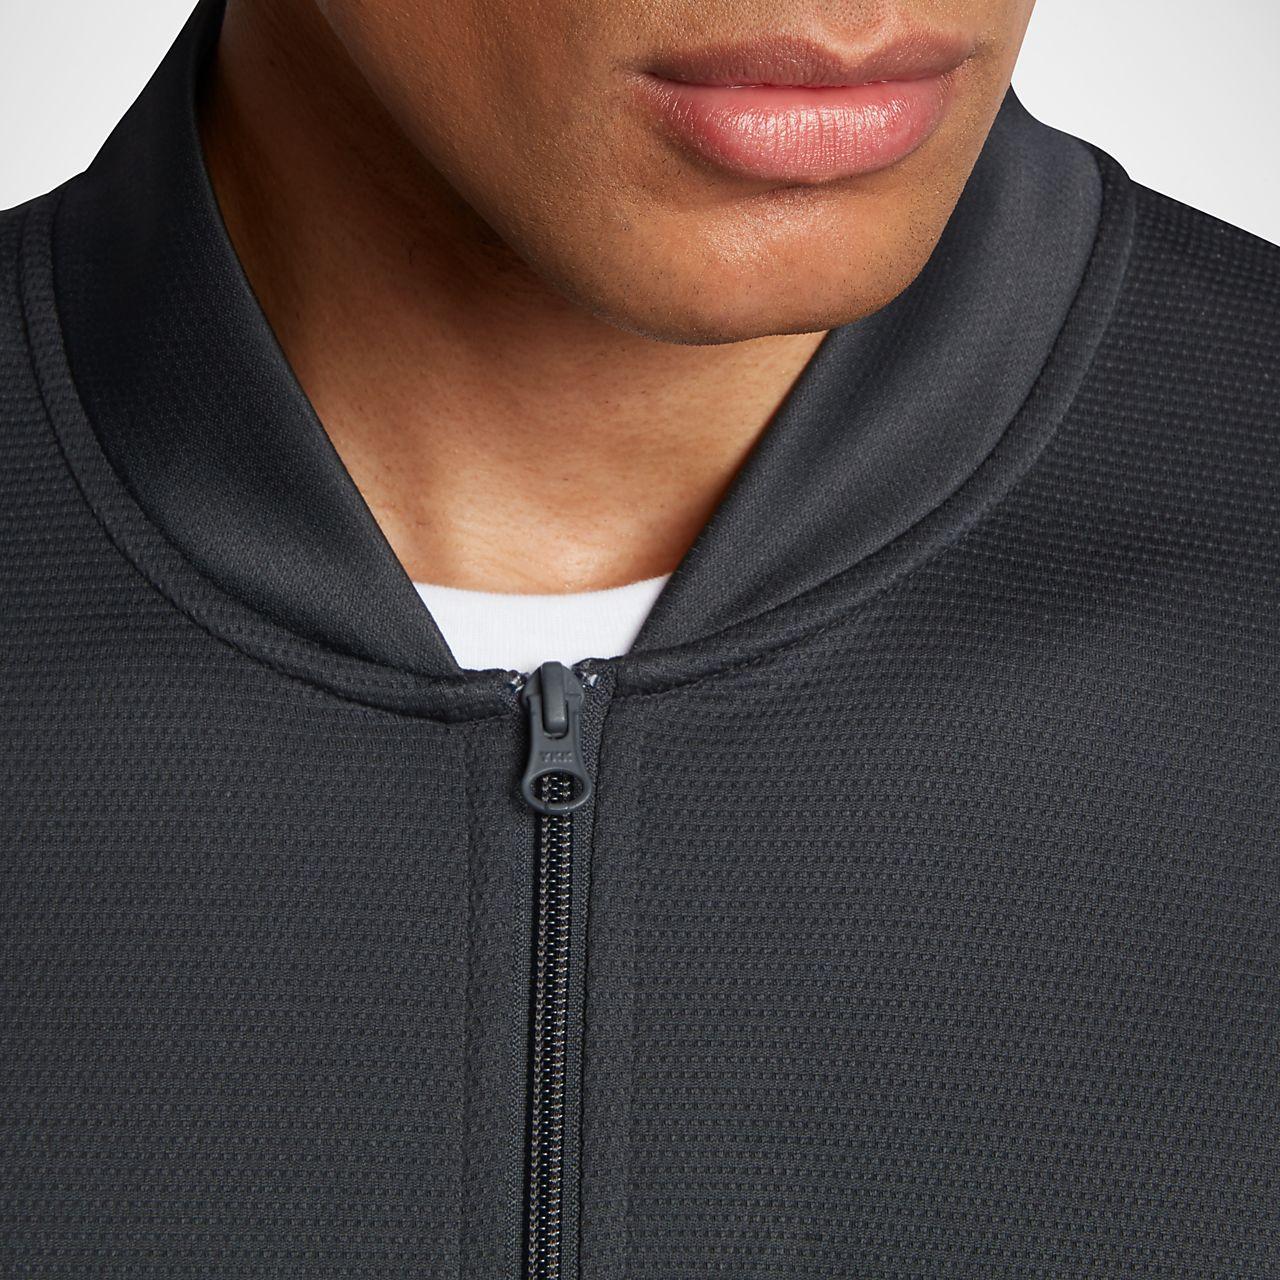 d8b5a18c Nike Dri-FIT Men's Basketball Jacket. Nike.com